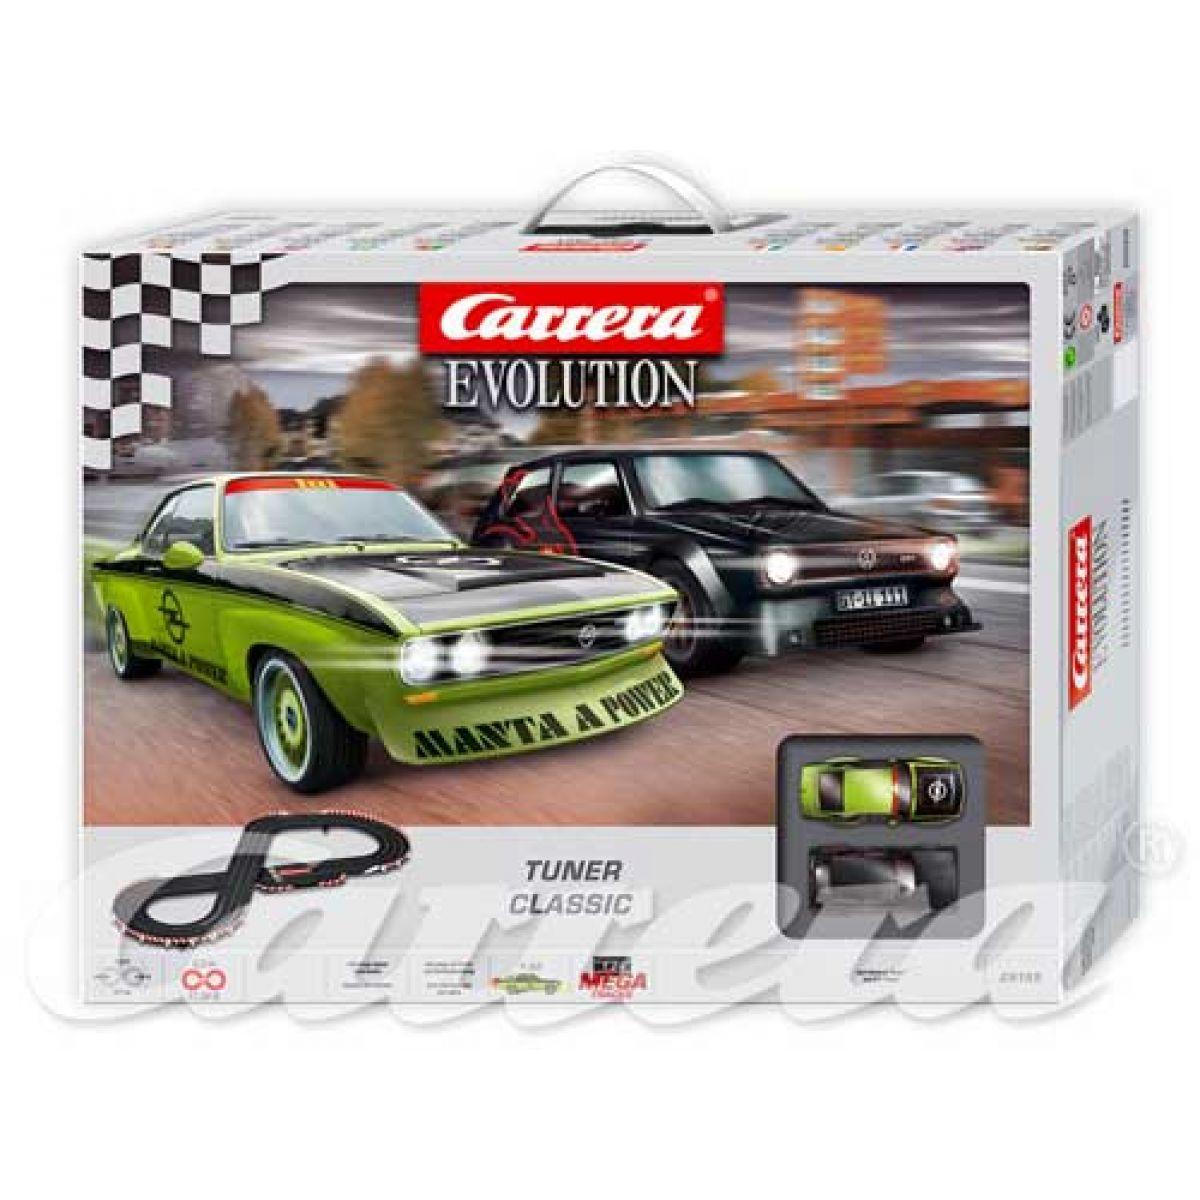 Carrera Tuner Classic